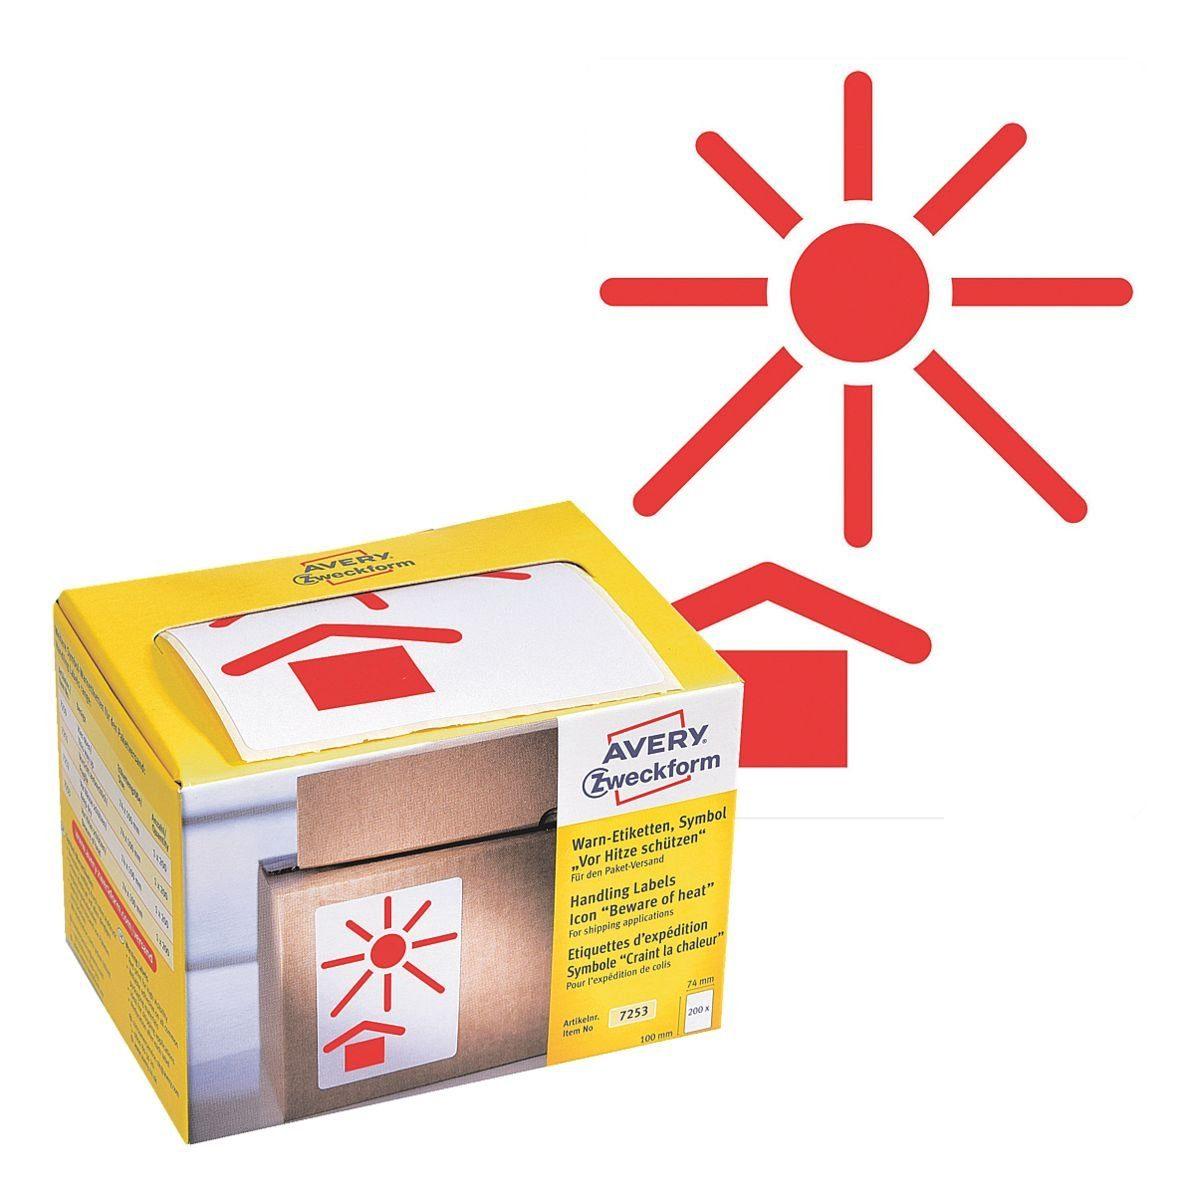 Avery Zweckform Warnetiketten 7253 , 74 x 100 mm »Symbol Hitze«